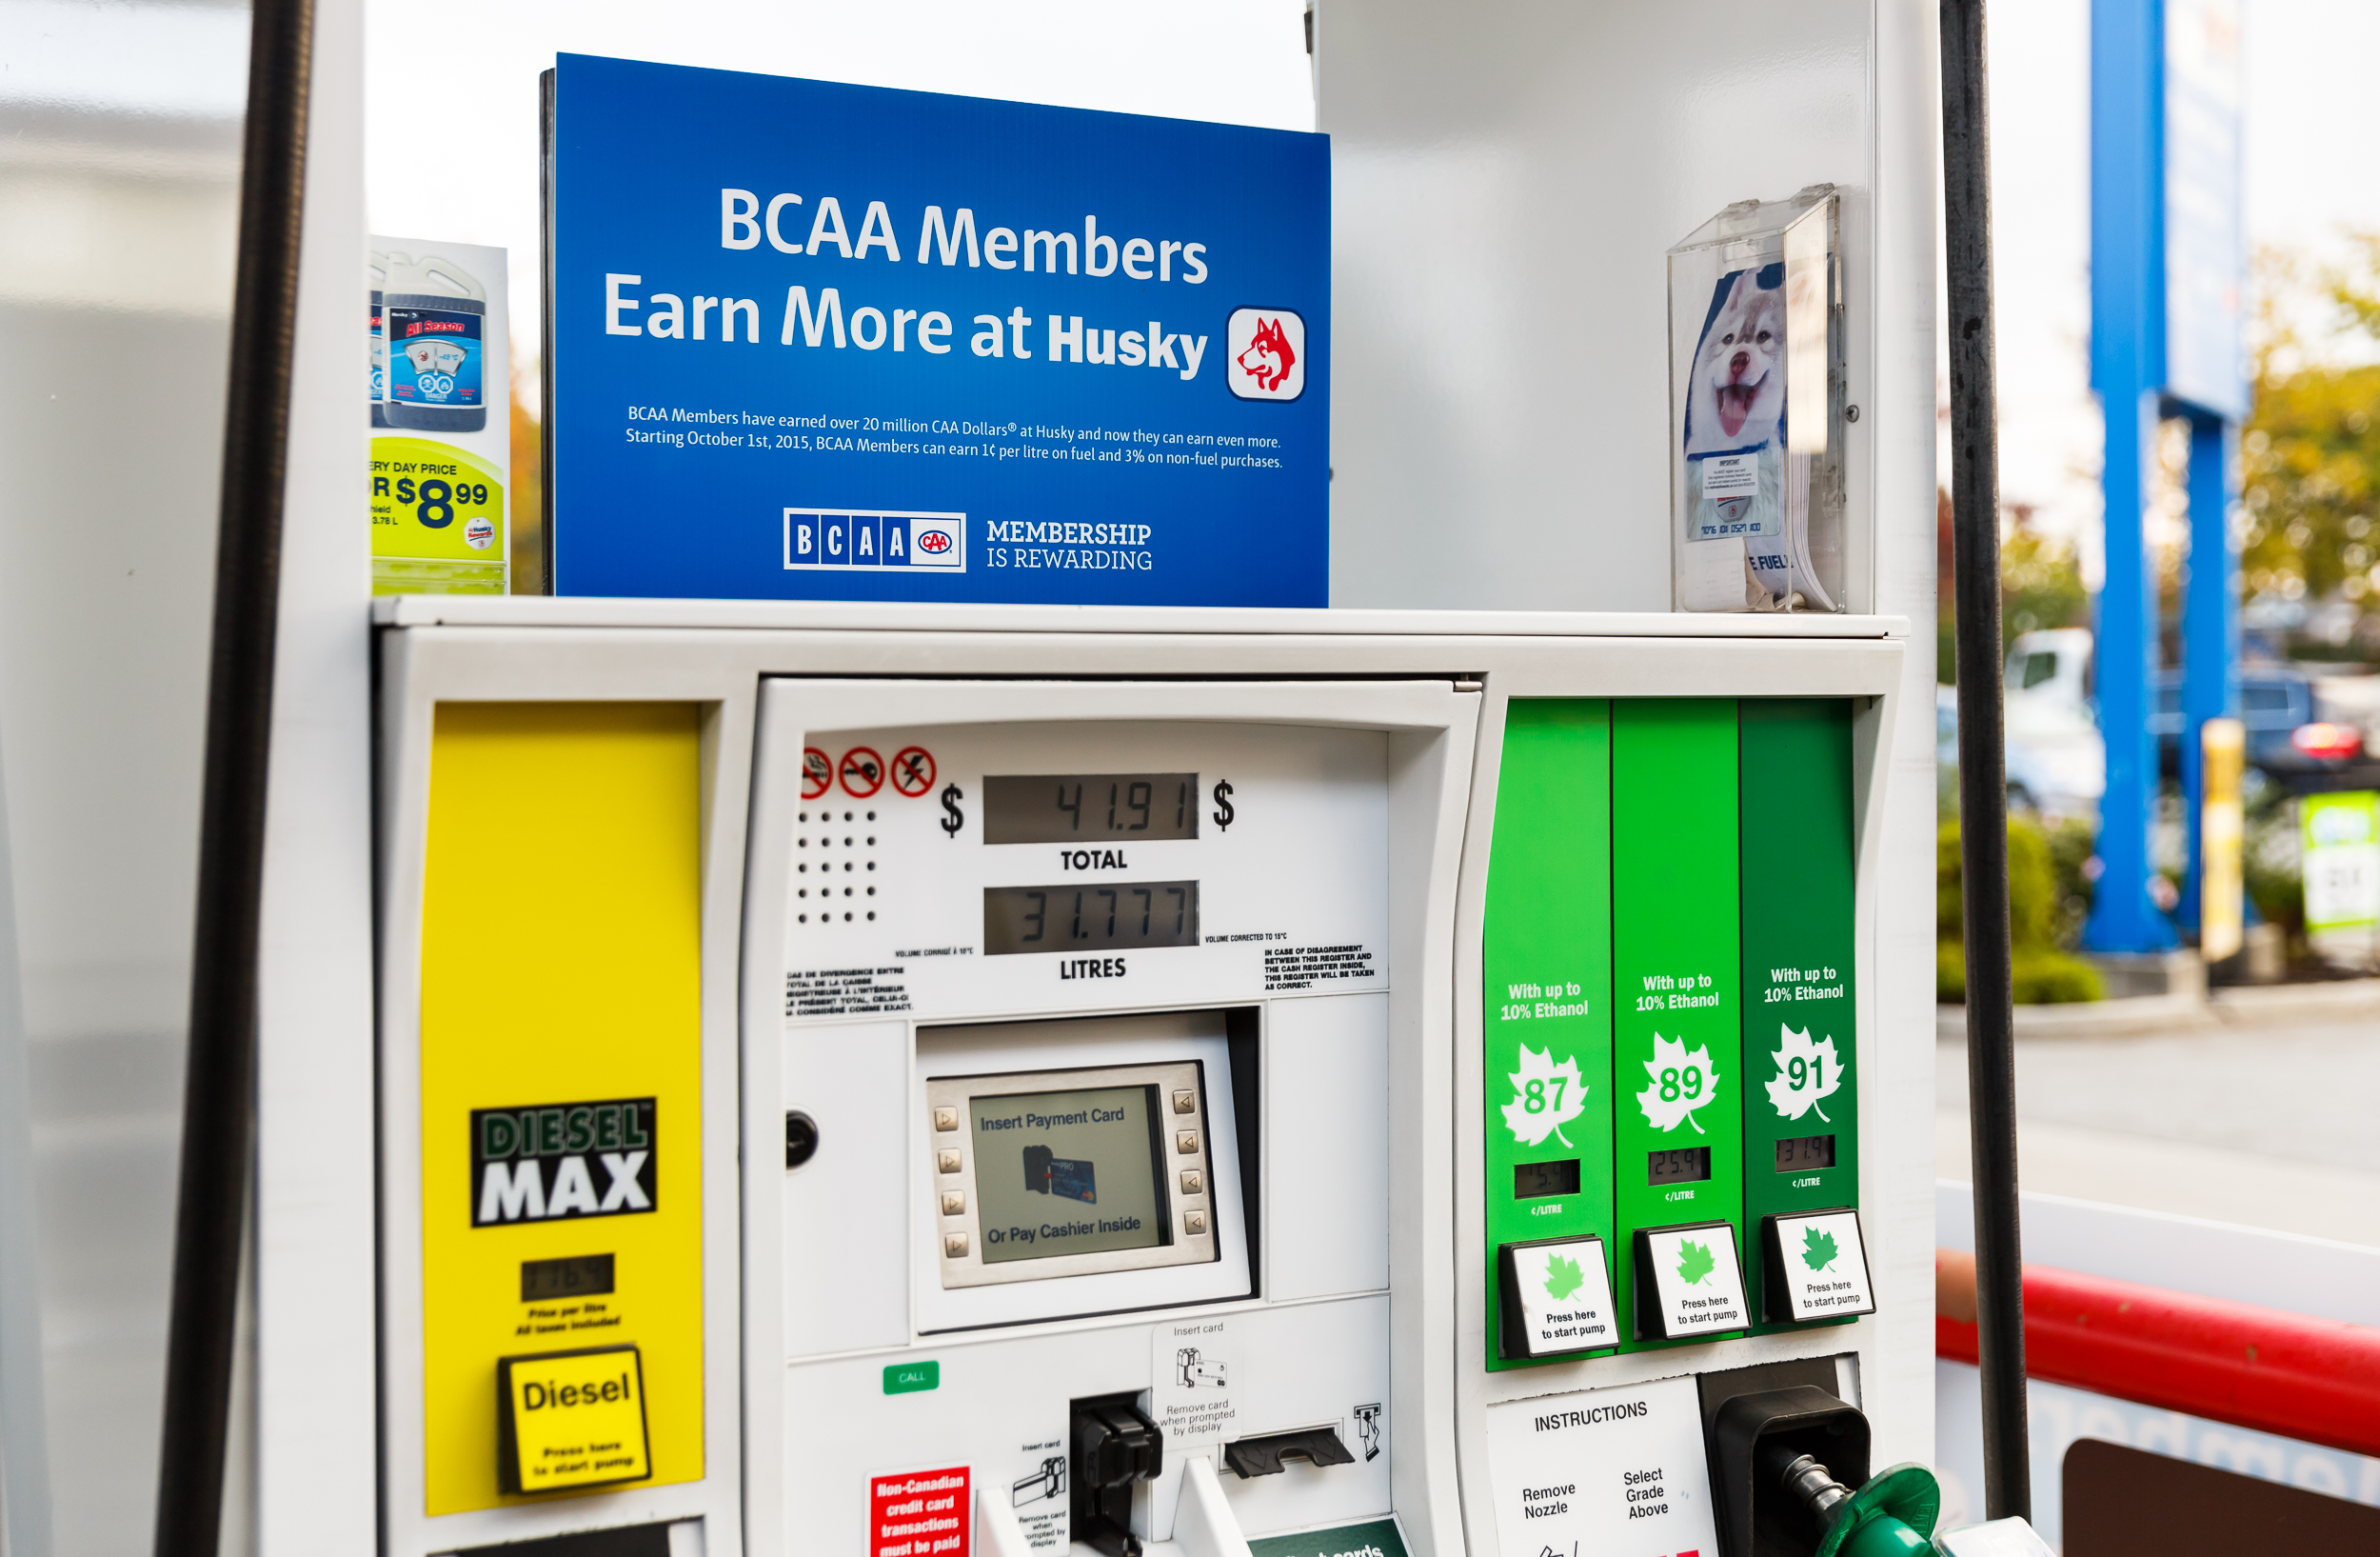 BCAA-Member-Rewards-image16.jpg